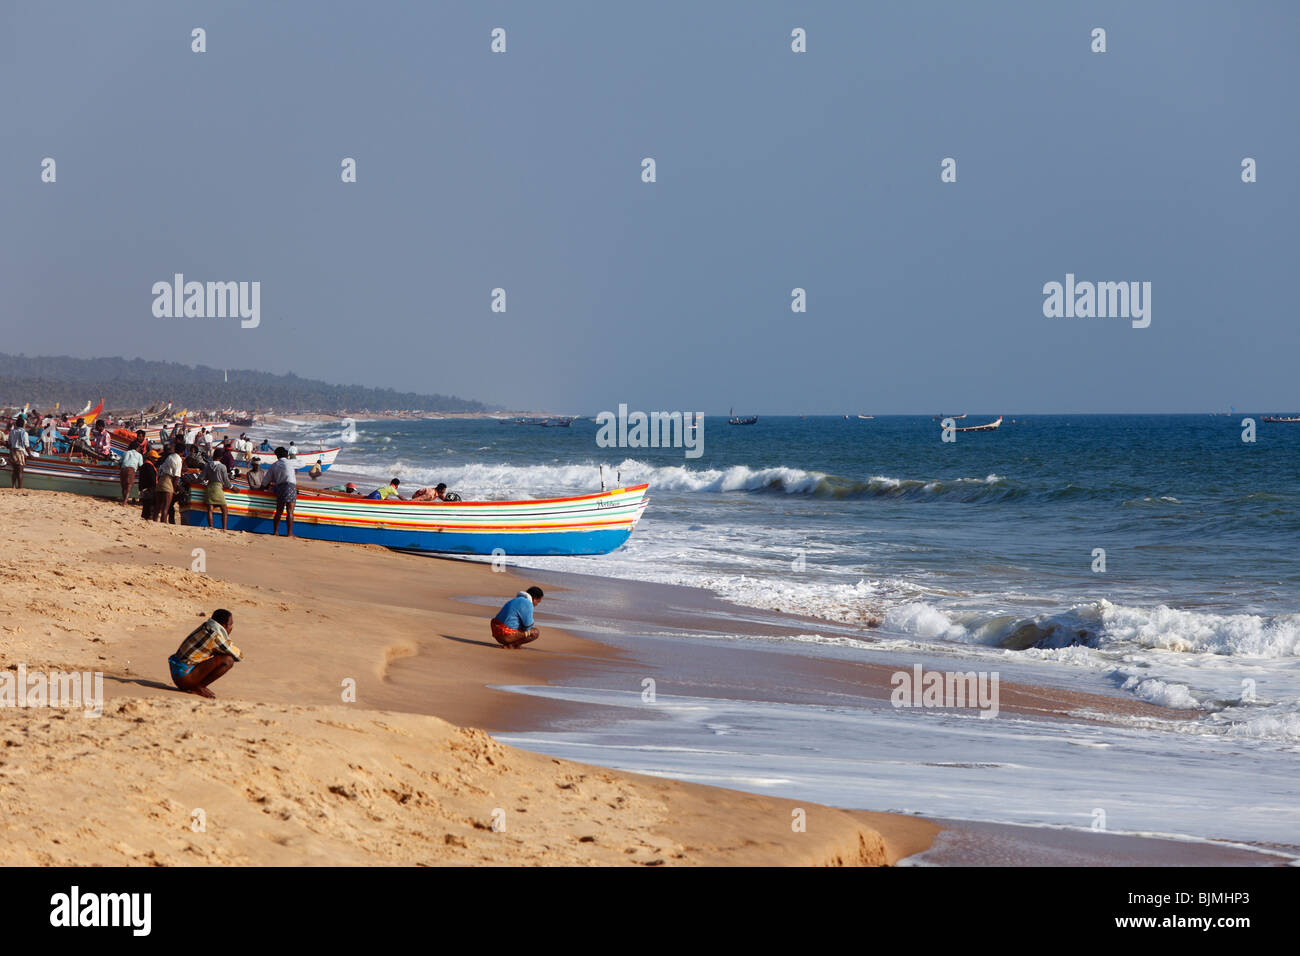 Fishermen prepare for taking their fishing boats out to sea, Somatheeram Beach, Malabarian Coast, Malabar, Kerala - Stock Image